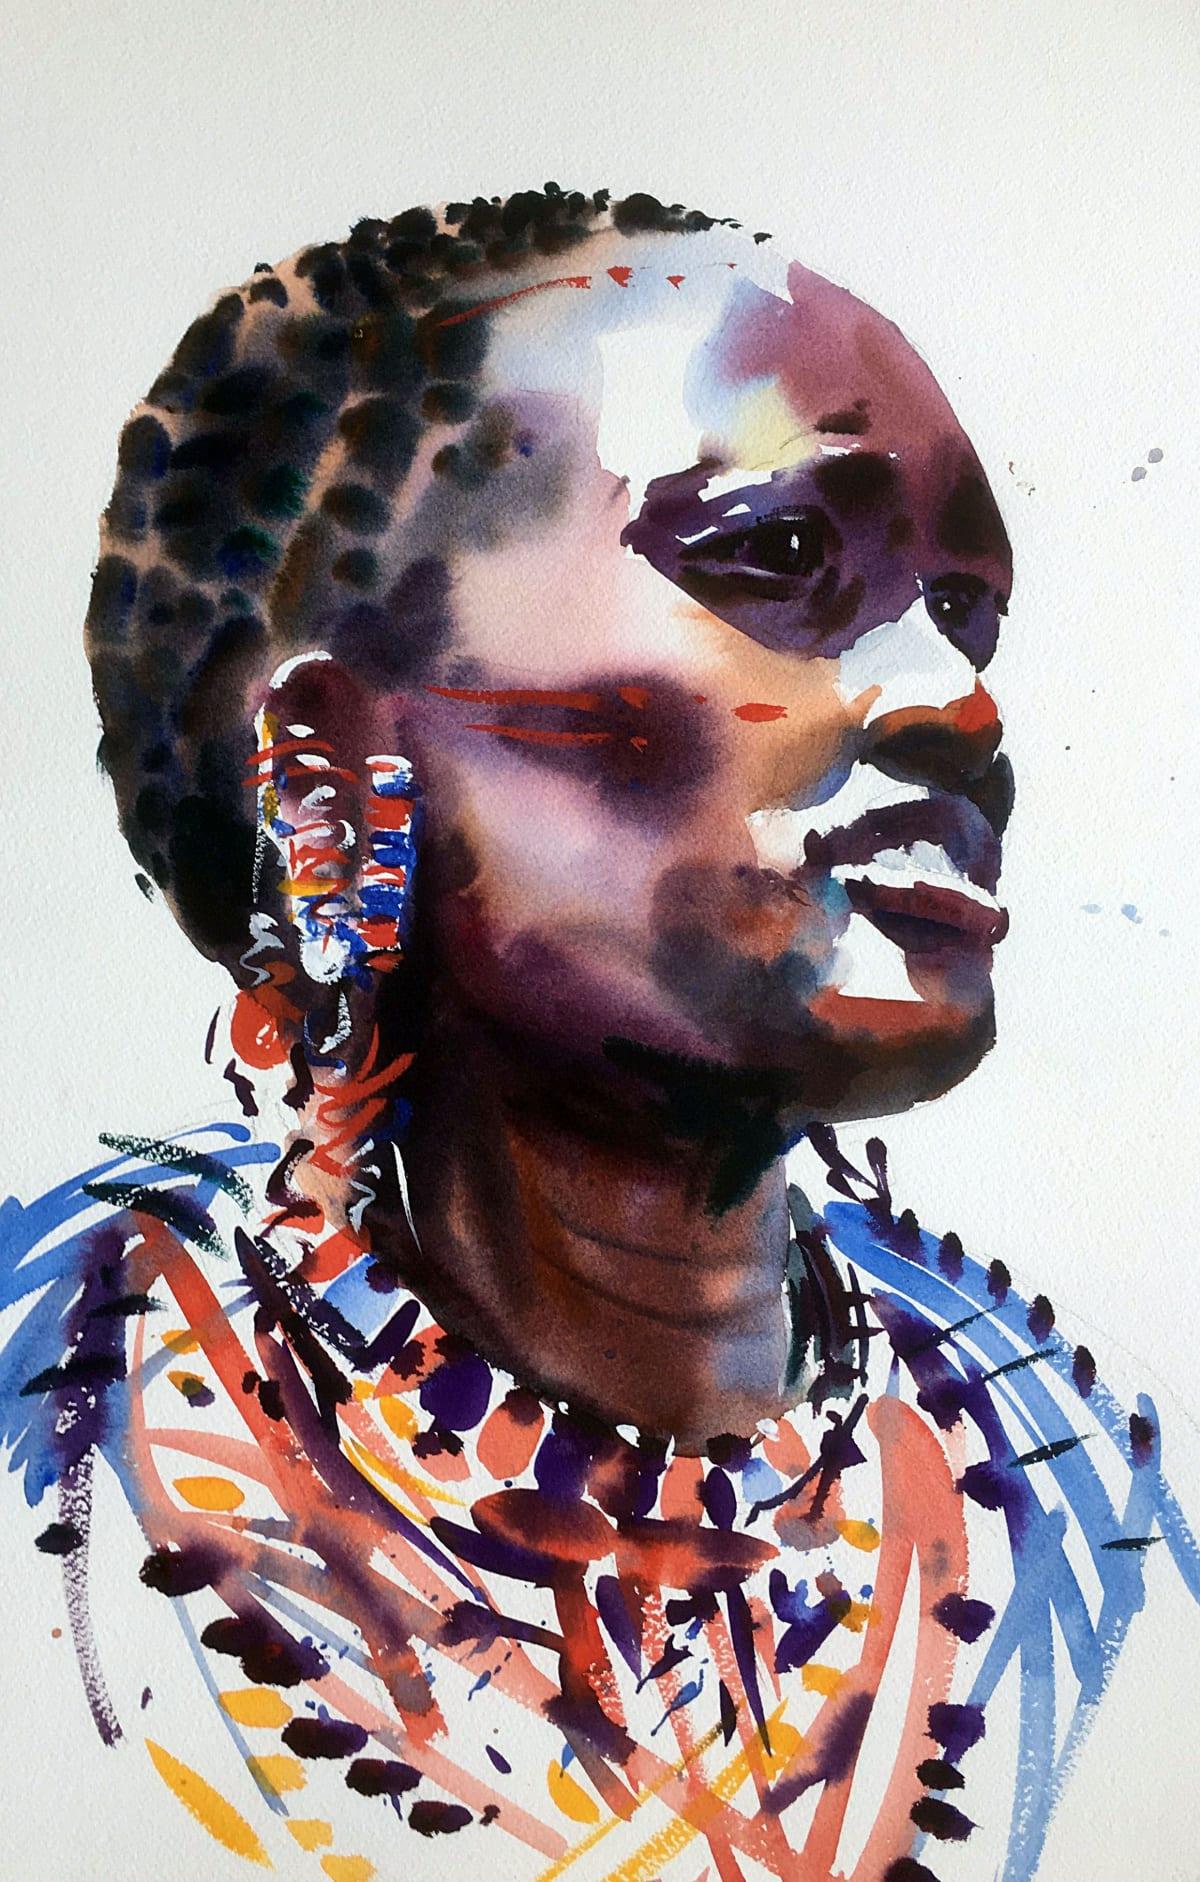 Jake Winkle ELEGANT MAASAI Watercolour 18 x 13 in 45.7 x 33 cm